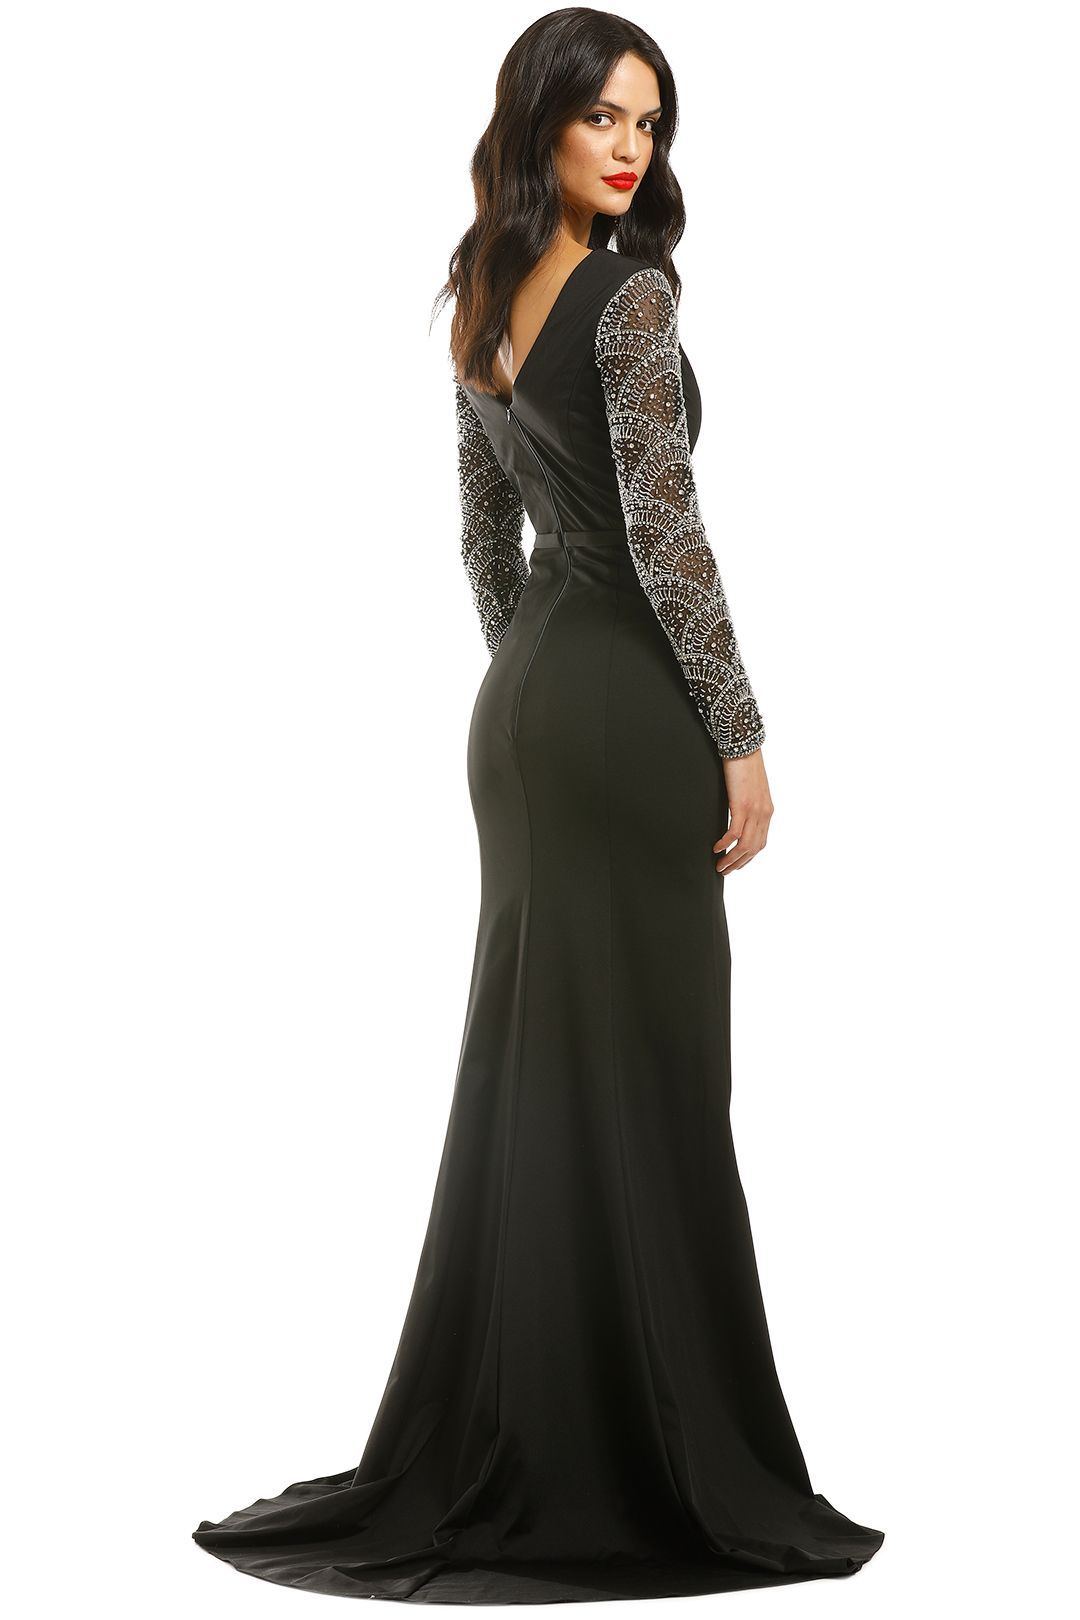 Jadore-Elizabeth-Gown-Black-Back